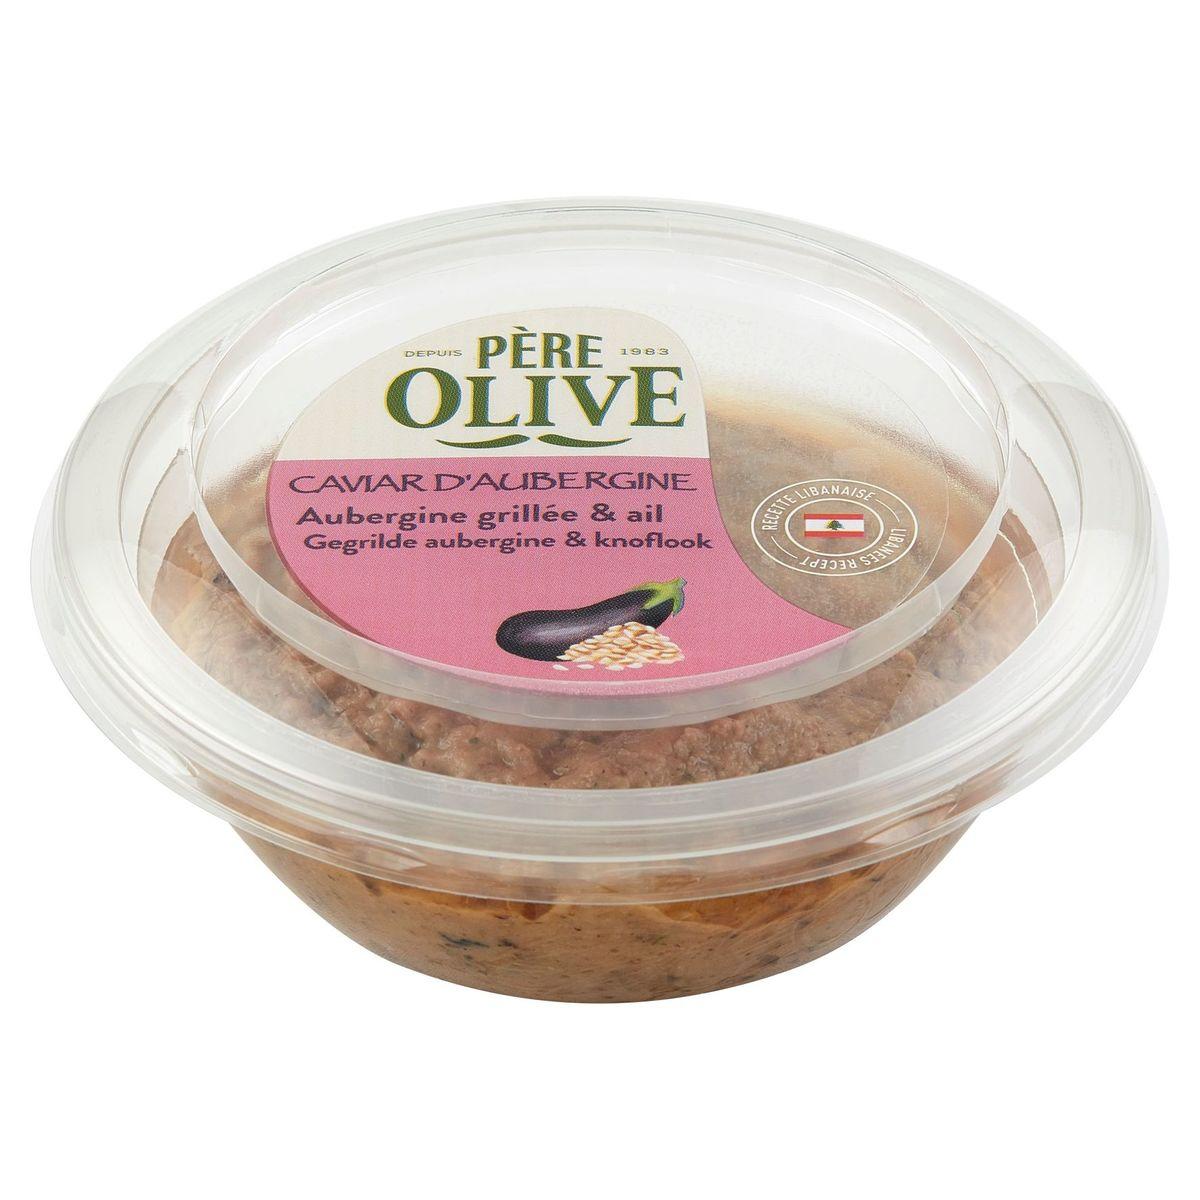 Père Olive Caviar d'Aubergine Grillée & Ail 175 g